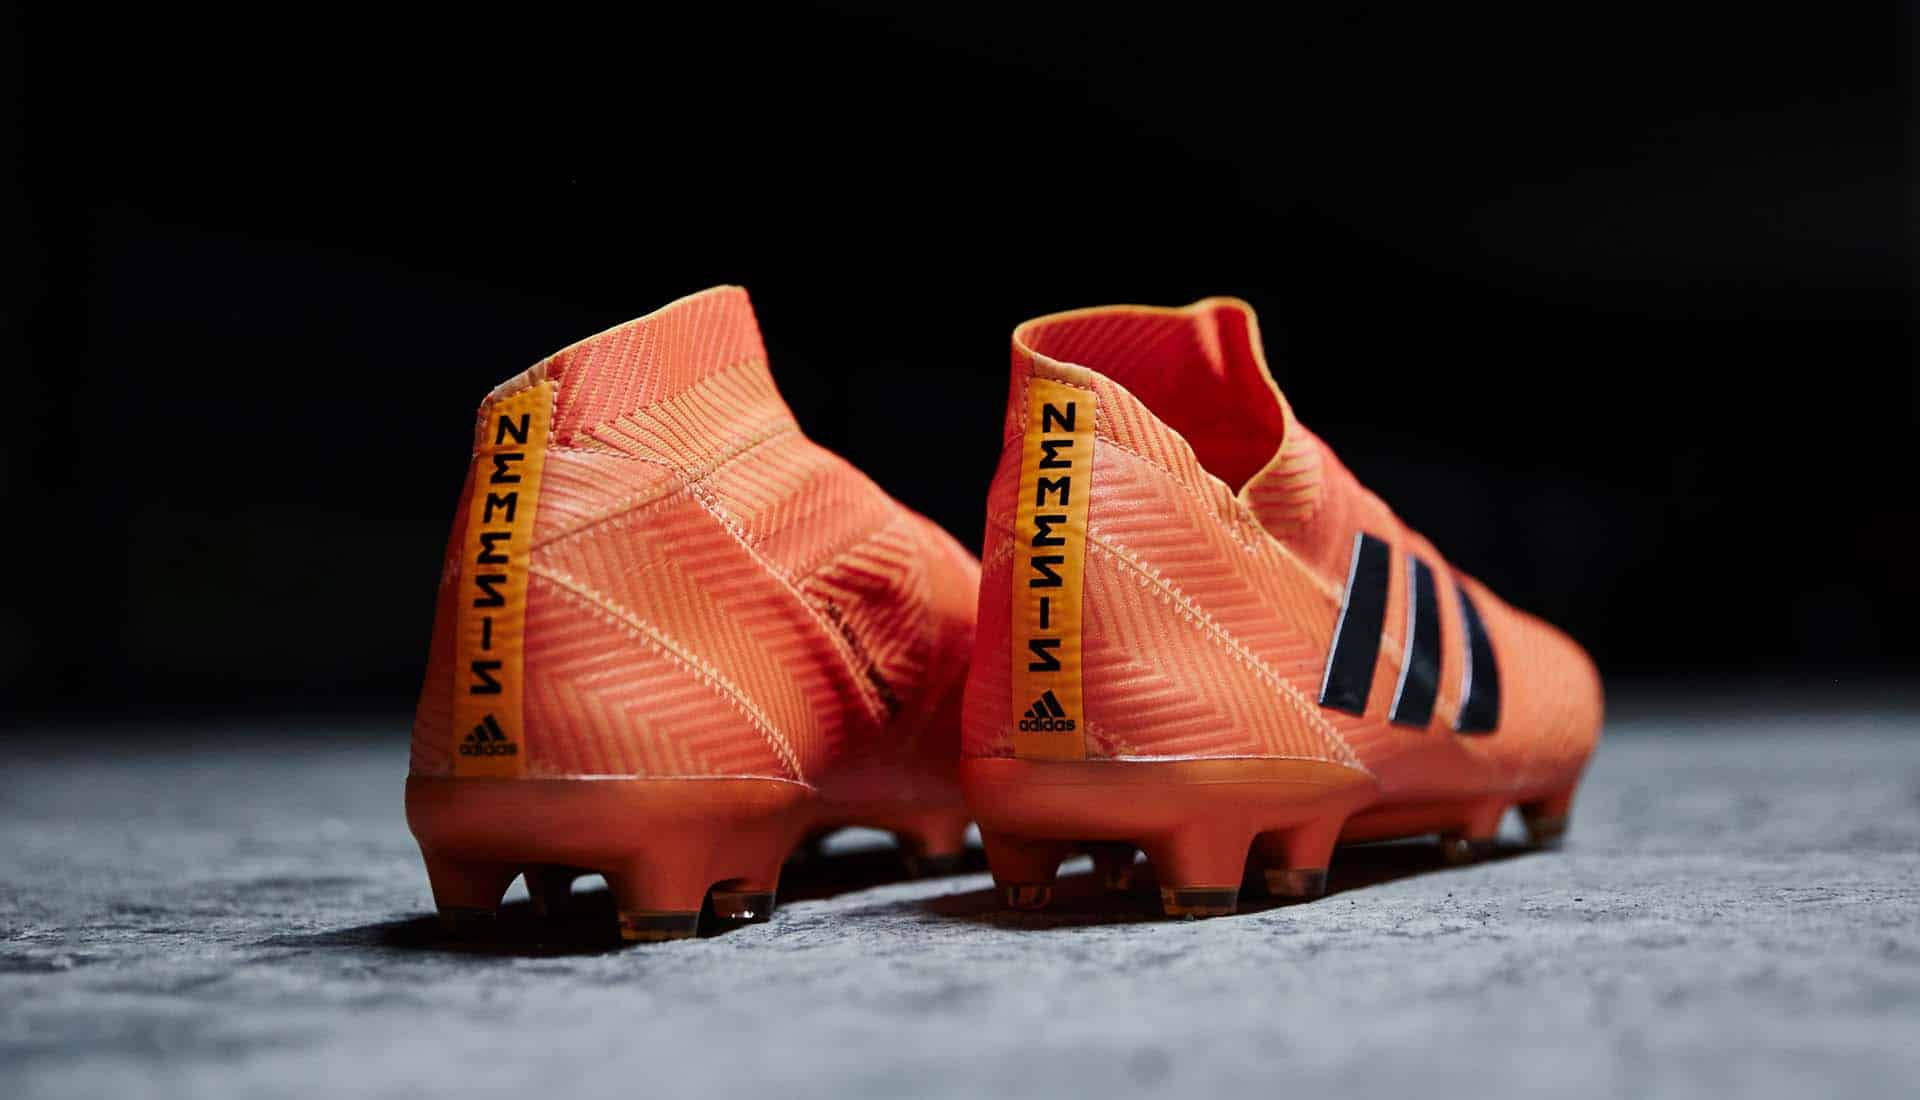 chaussures-adidas-Nemeziz-18-energy-mode-img3